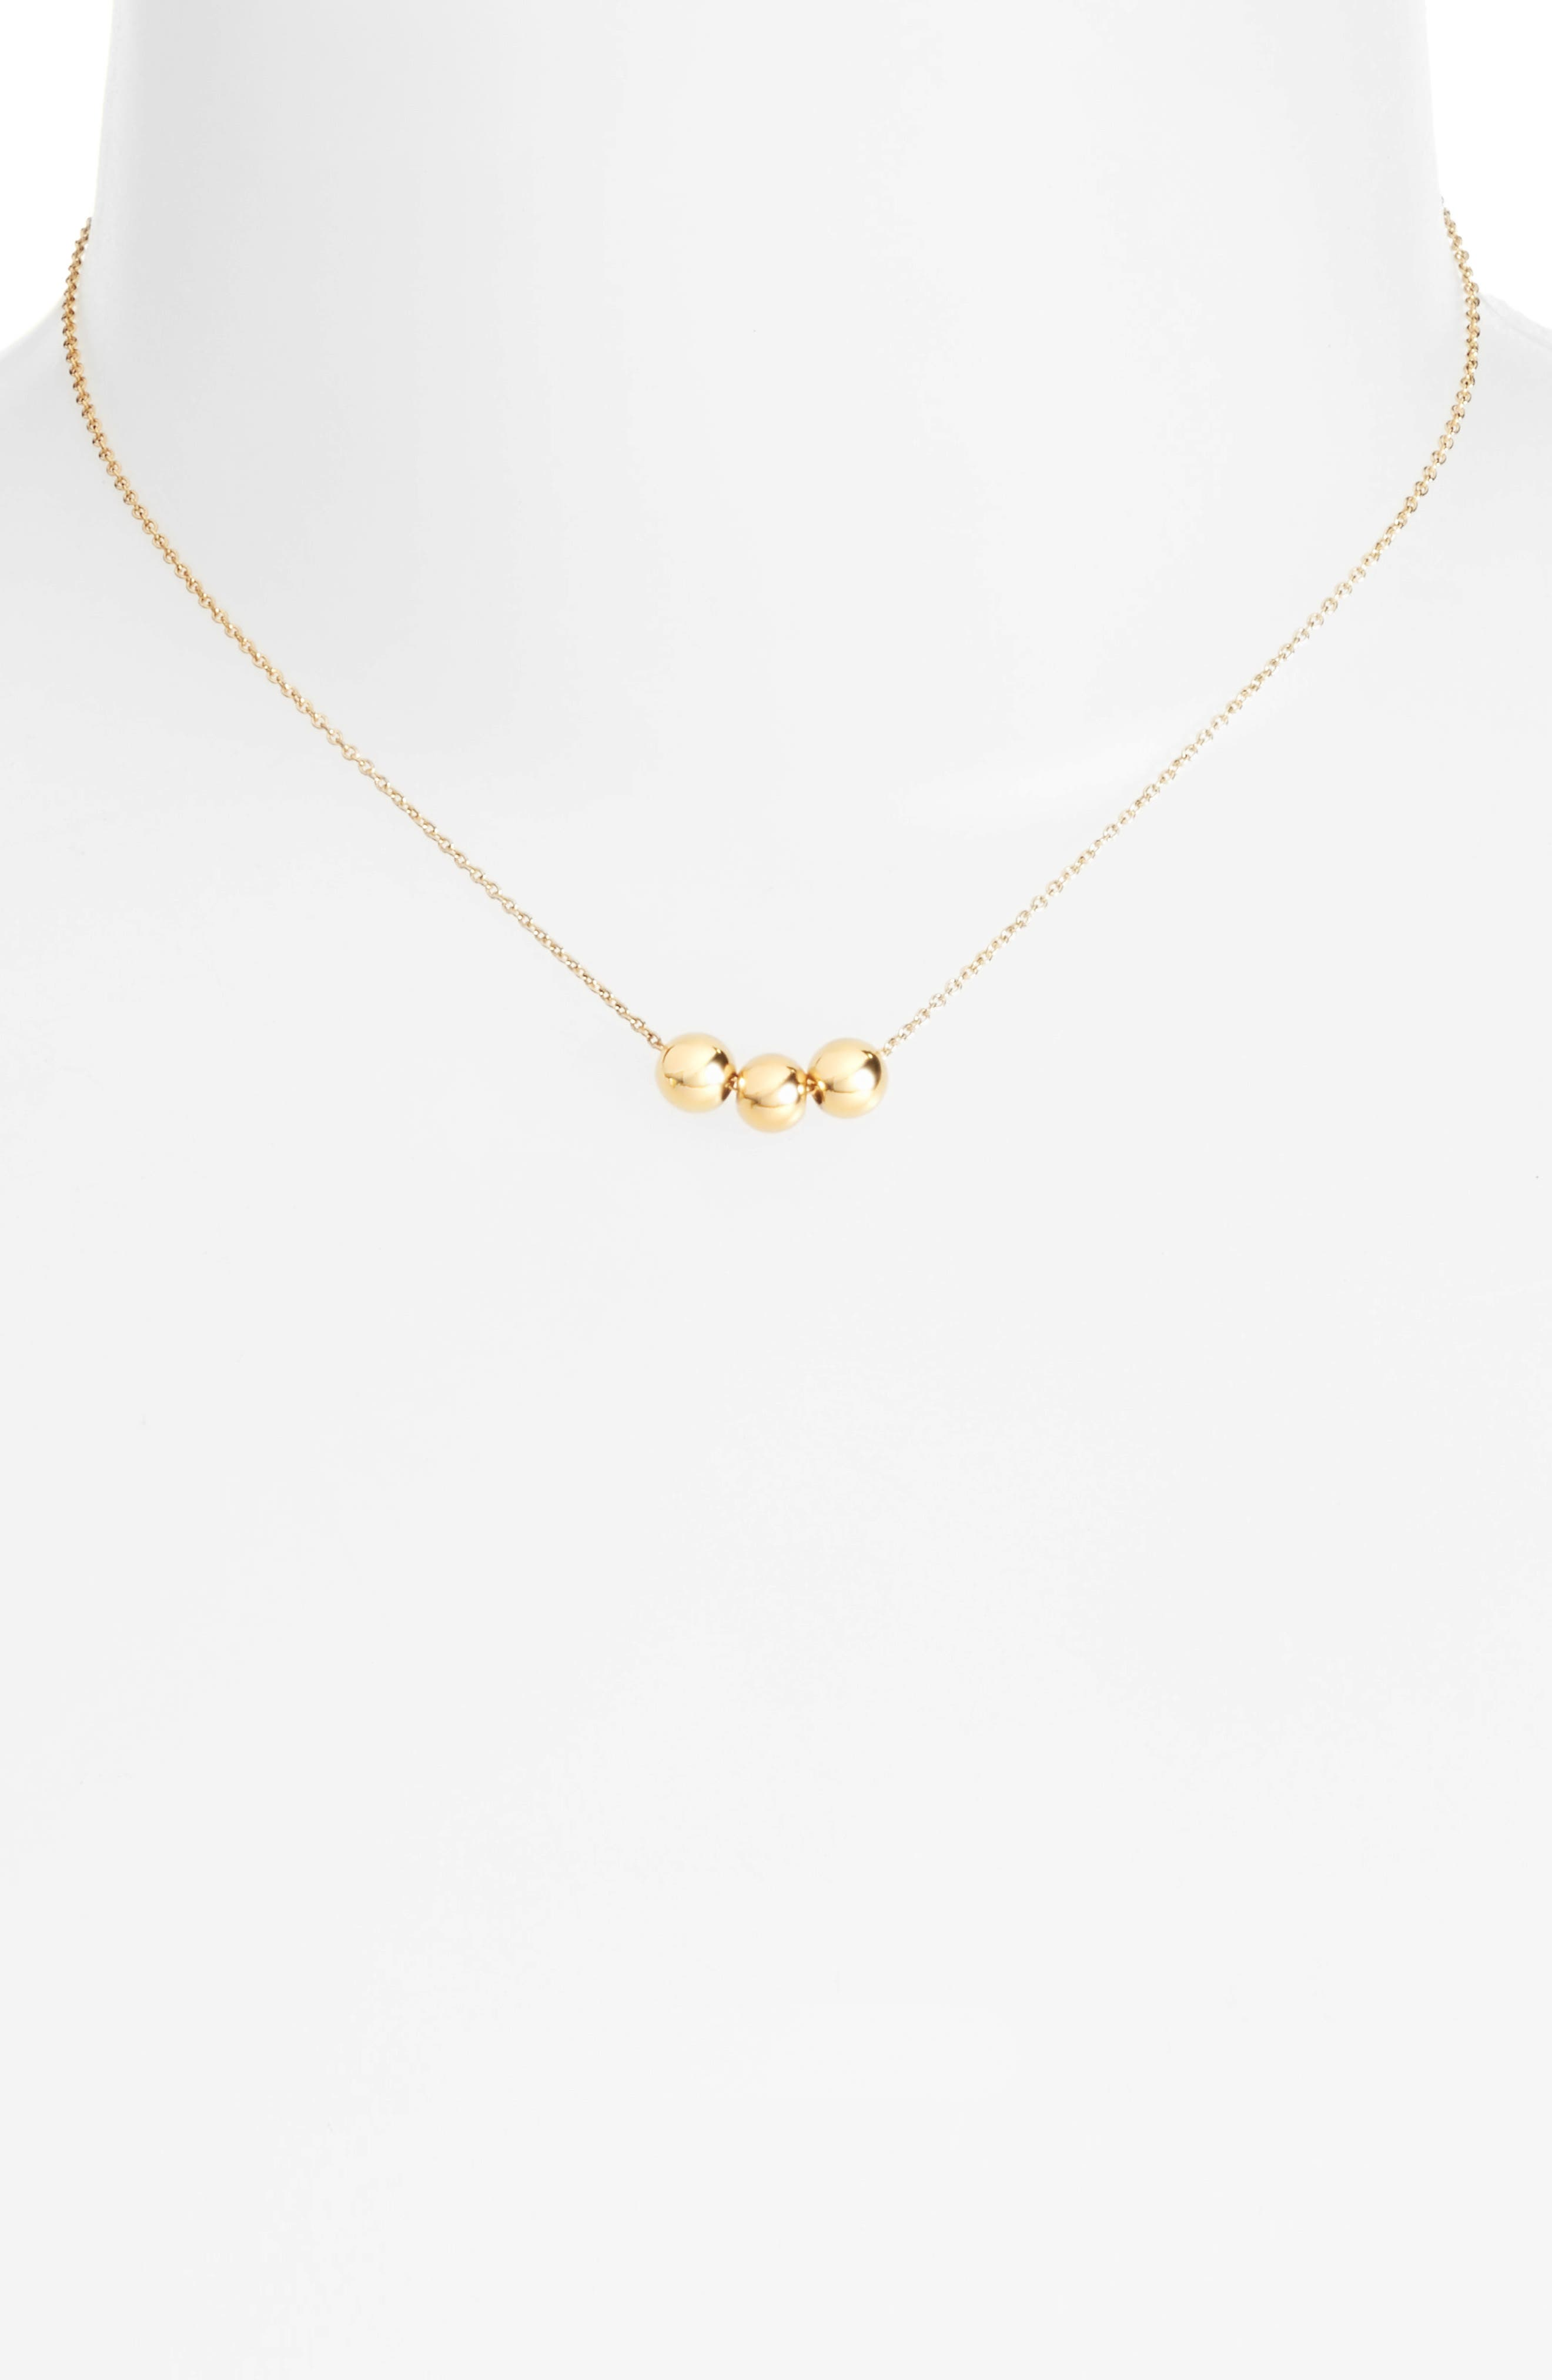 Gorjana Newport Three-Bead Golden Adjustable Necklace wfblOyVc2s